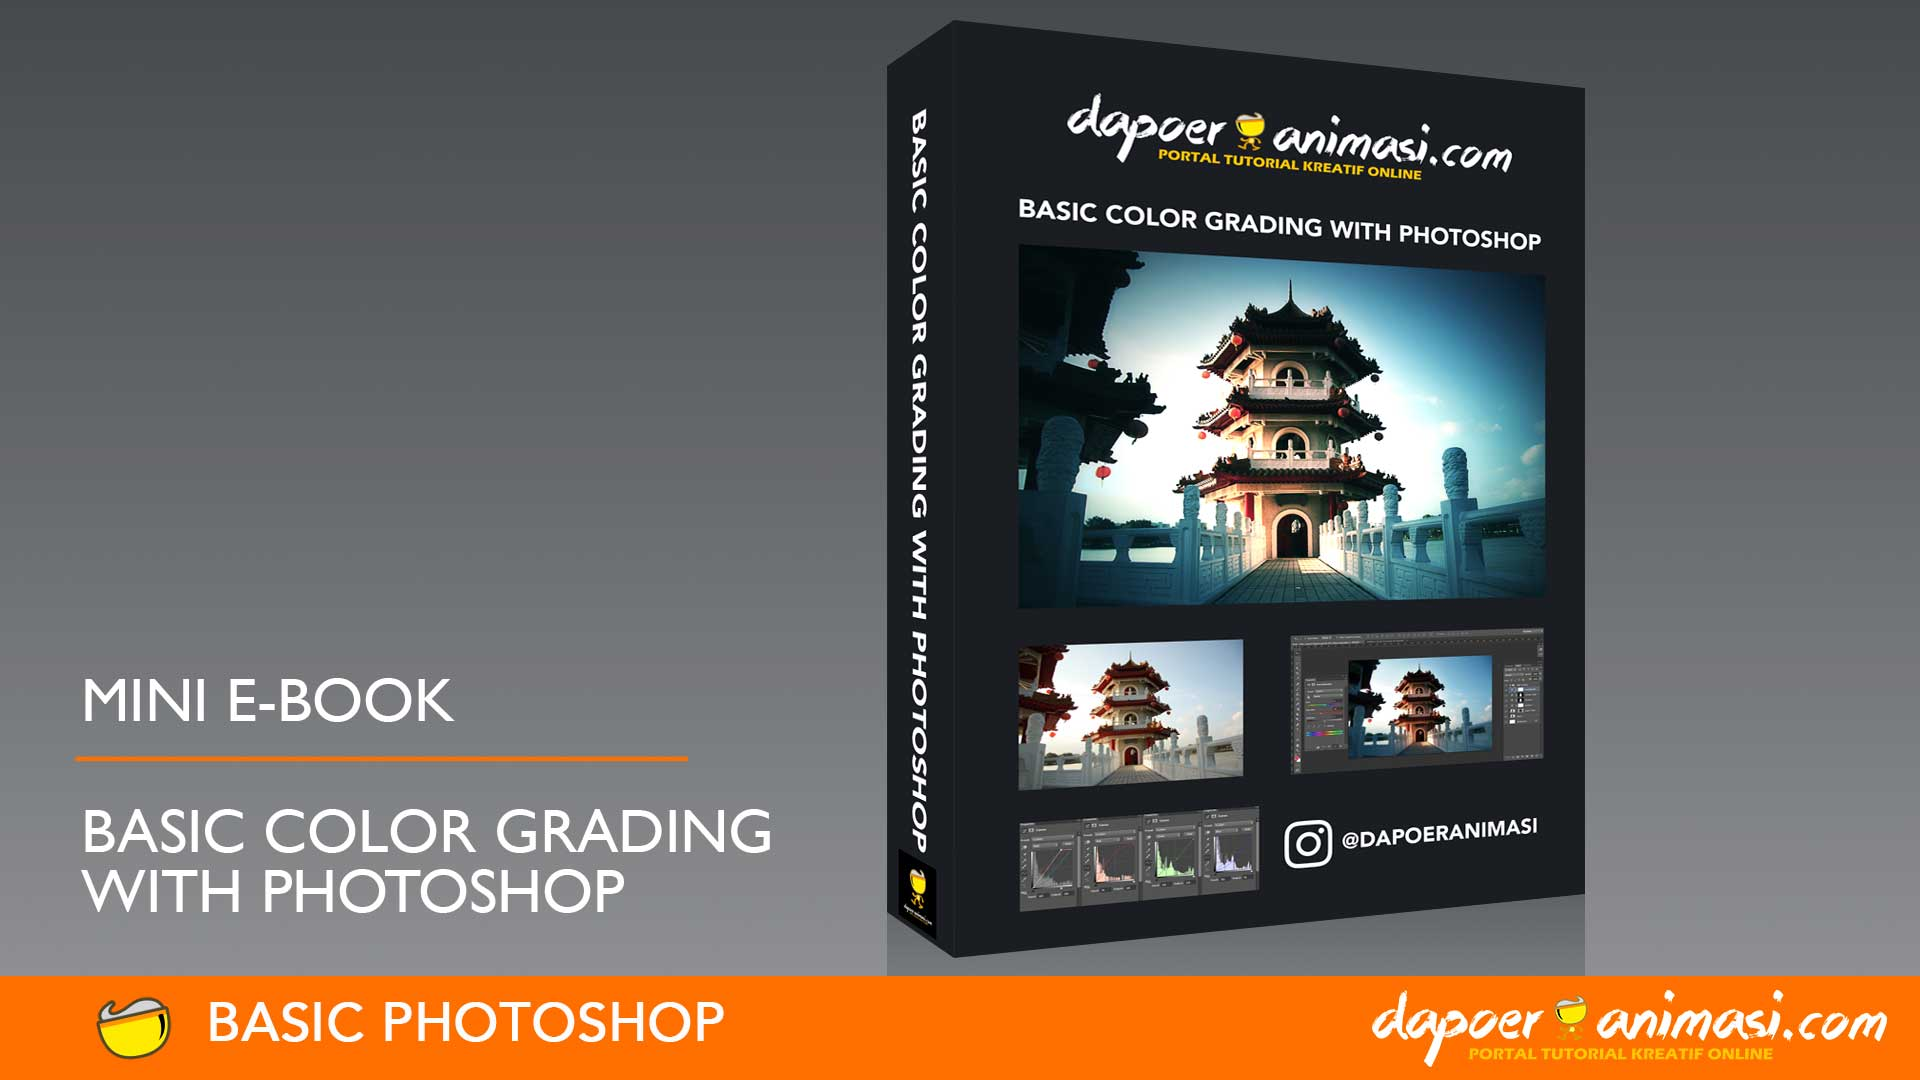 Dapoer Animasi : FREE Mini E-Book – Basic Color Grading with Photoshop